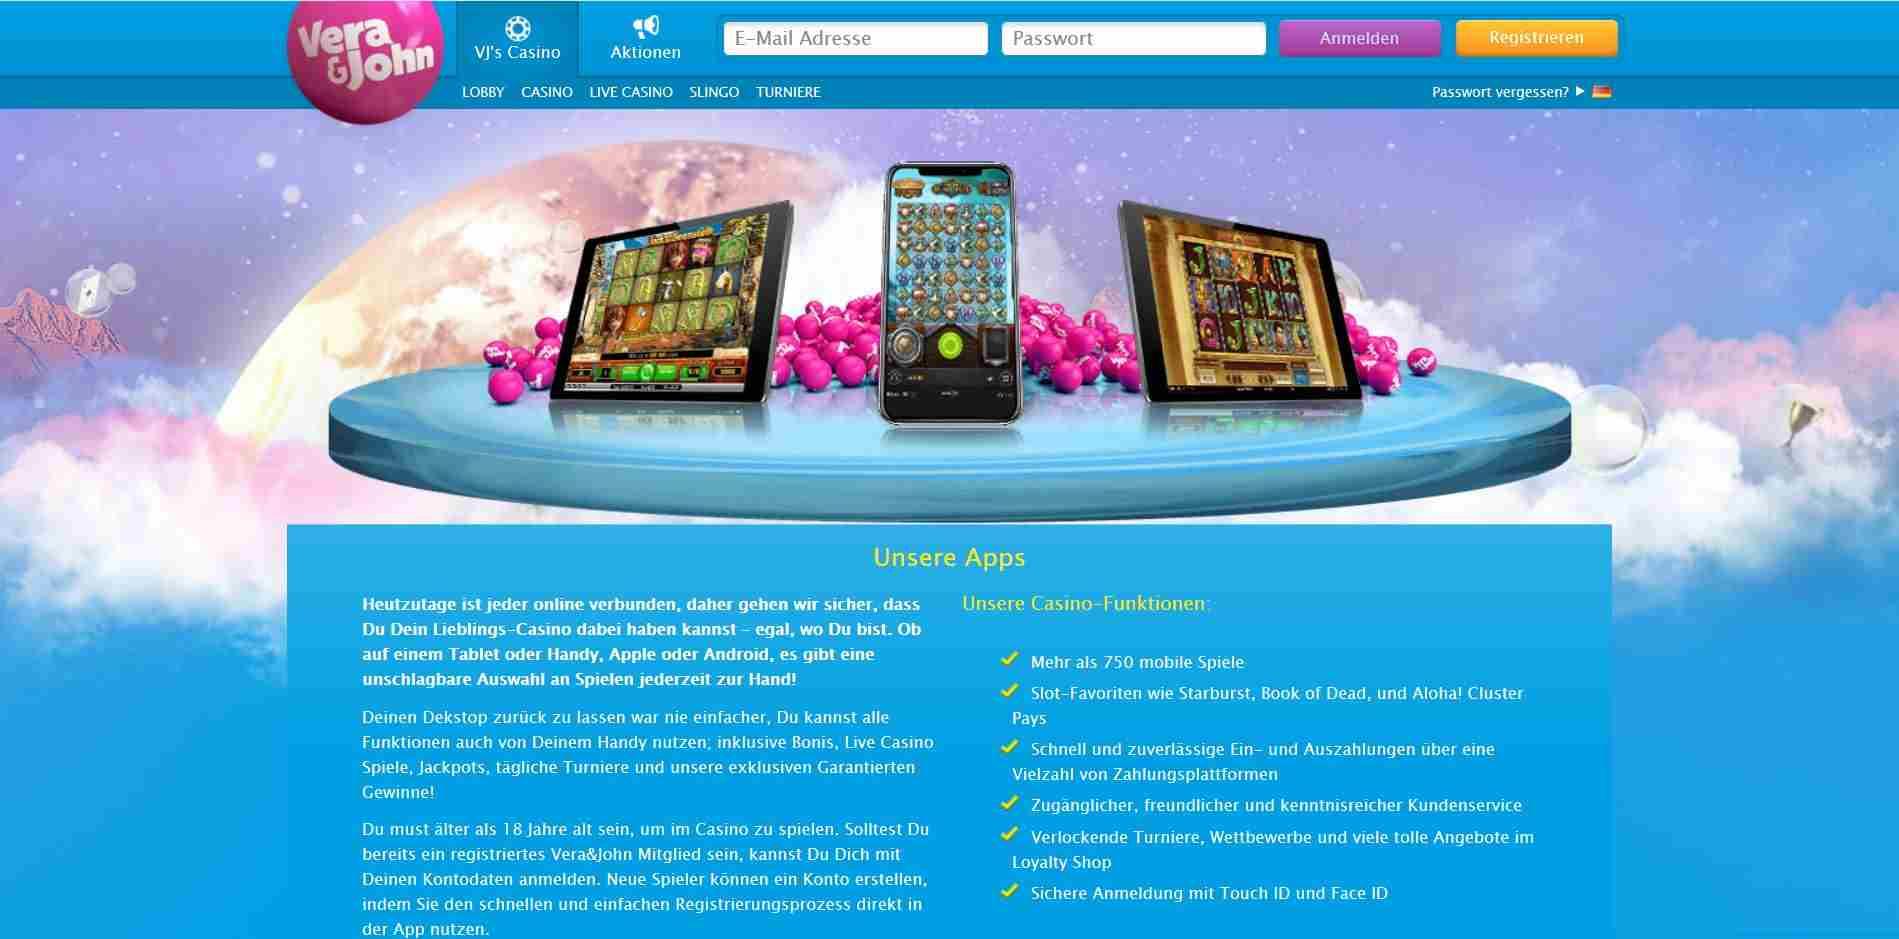 vera und john android casino apps